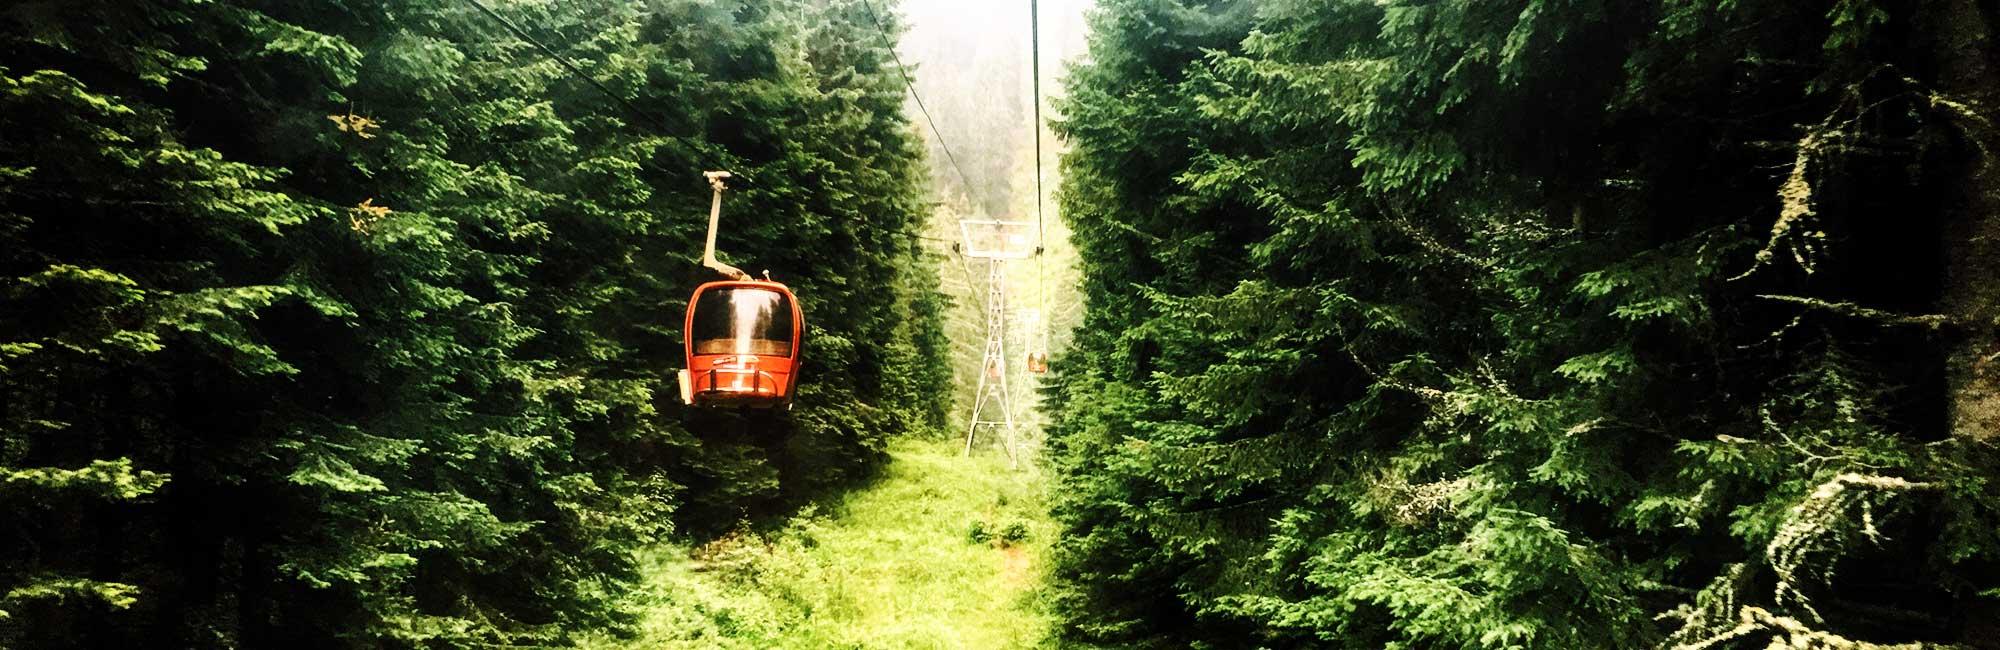 Gondola yastrebets lift